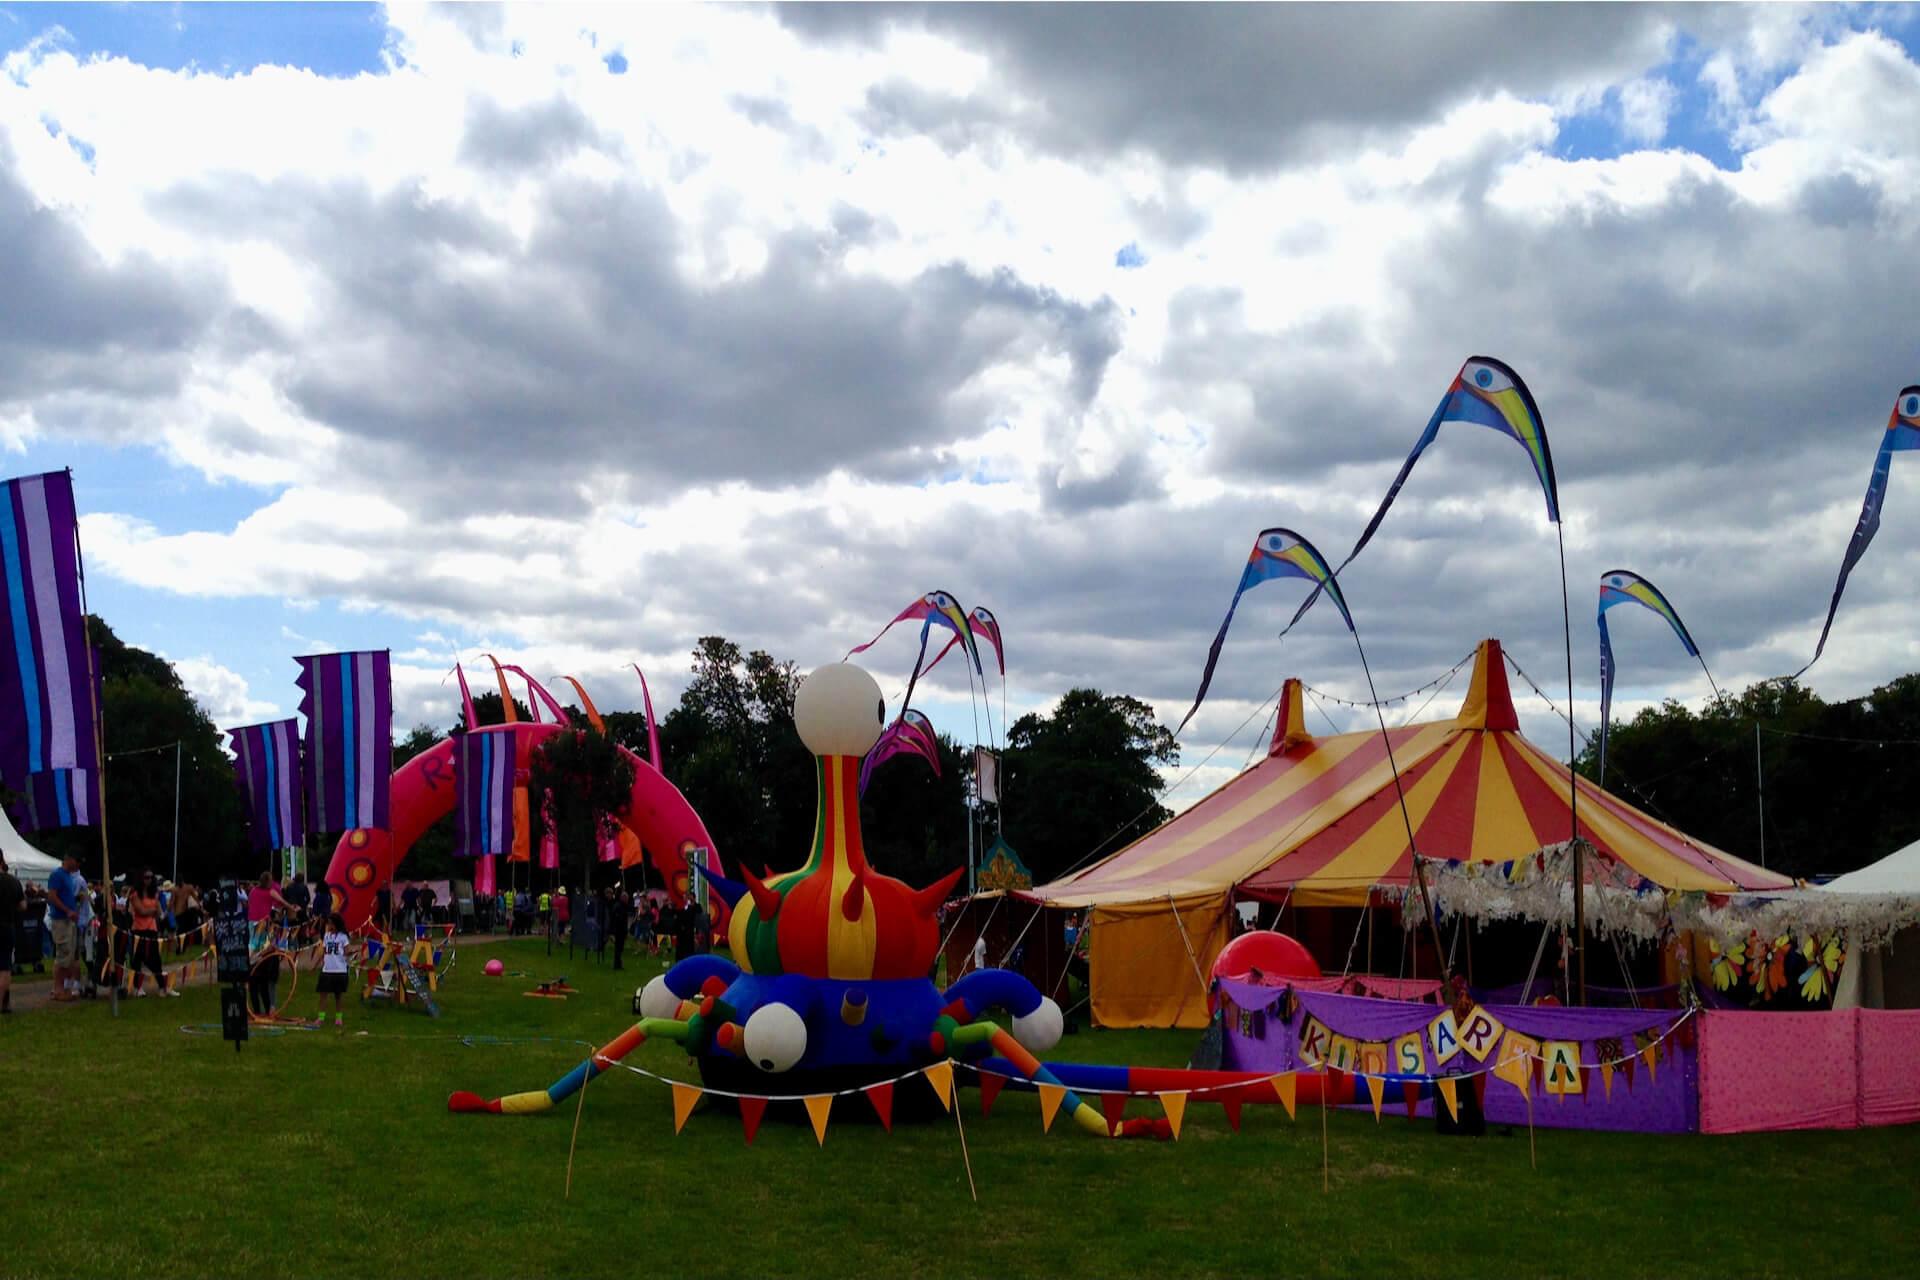 Rewind festival childrens area Oxfordshire